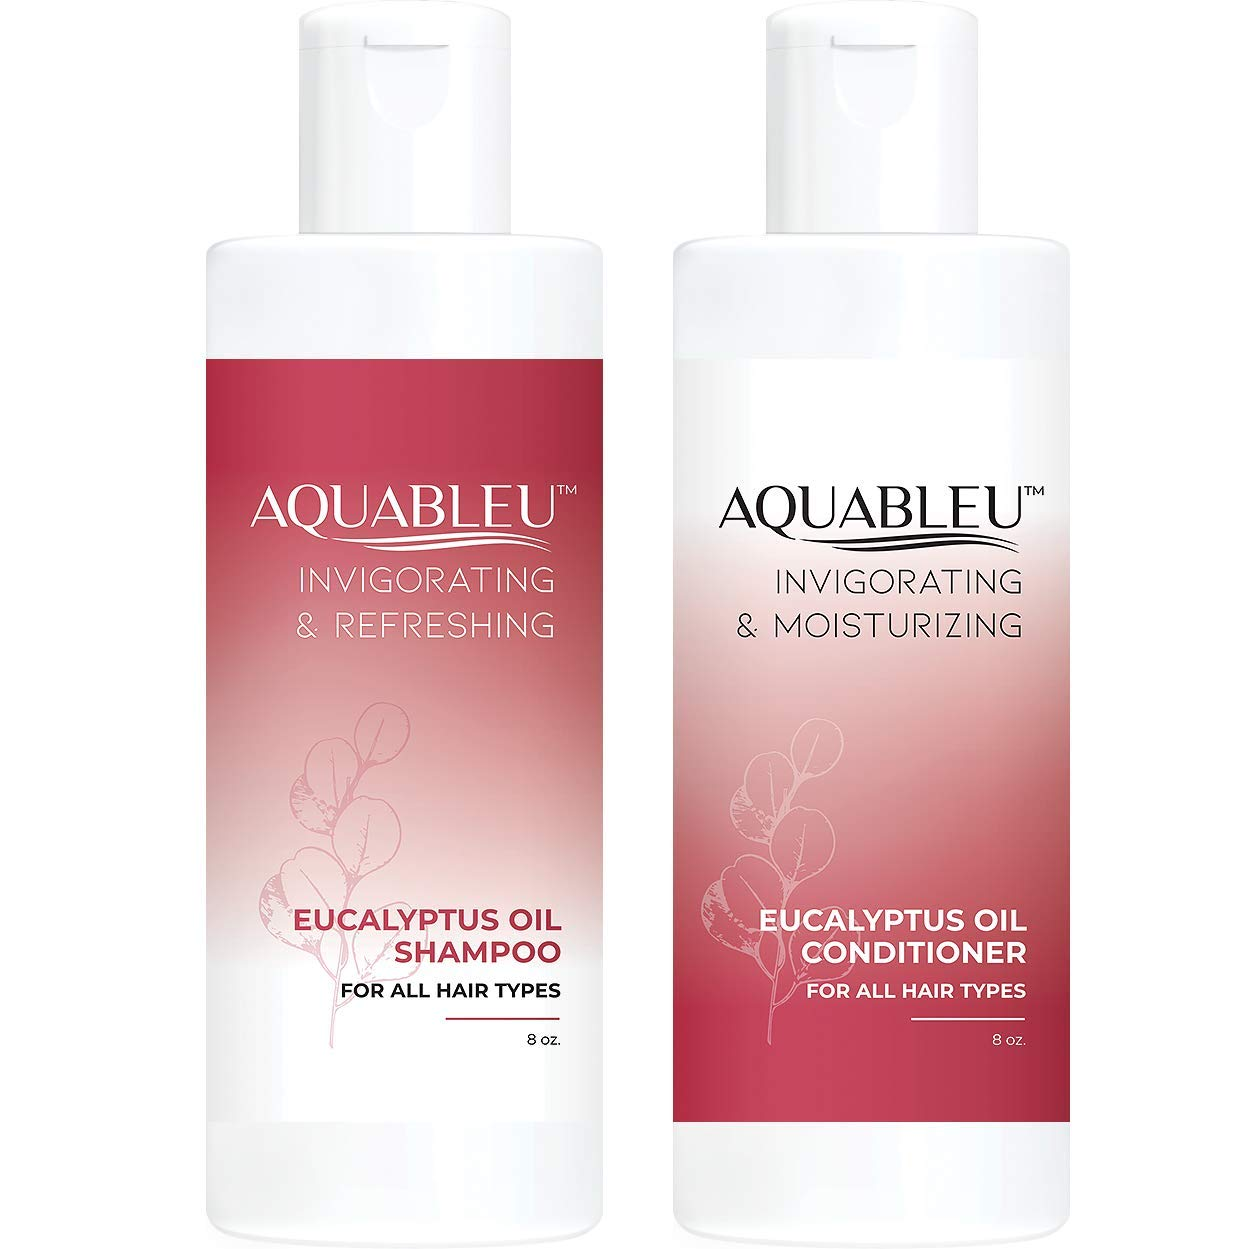 Aquableu Eucalyptus Shampoo Conditioner Set Invigorating - Reservation M It is very popular